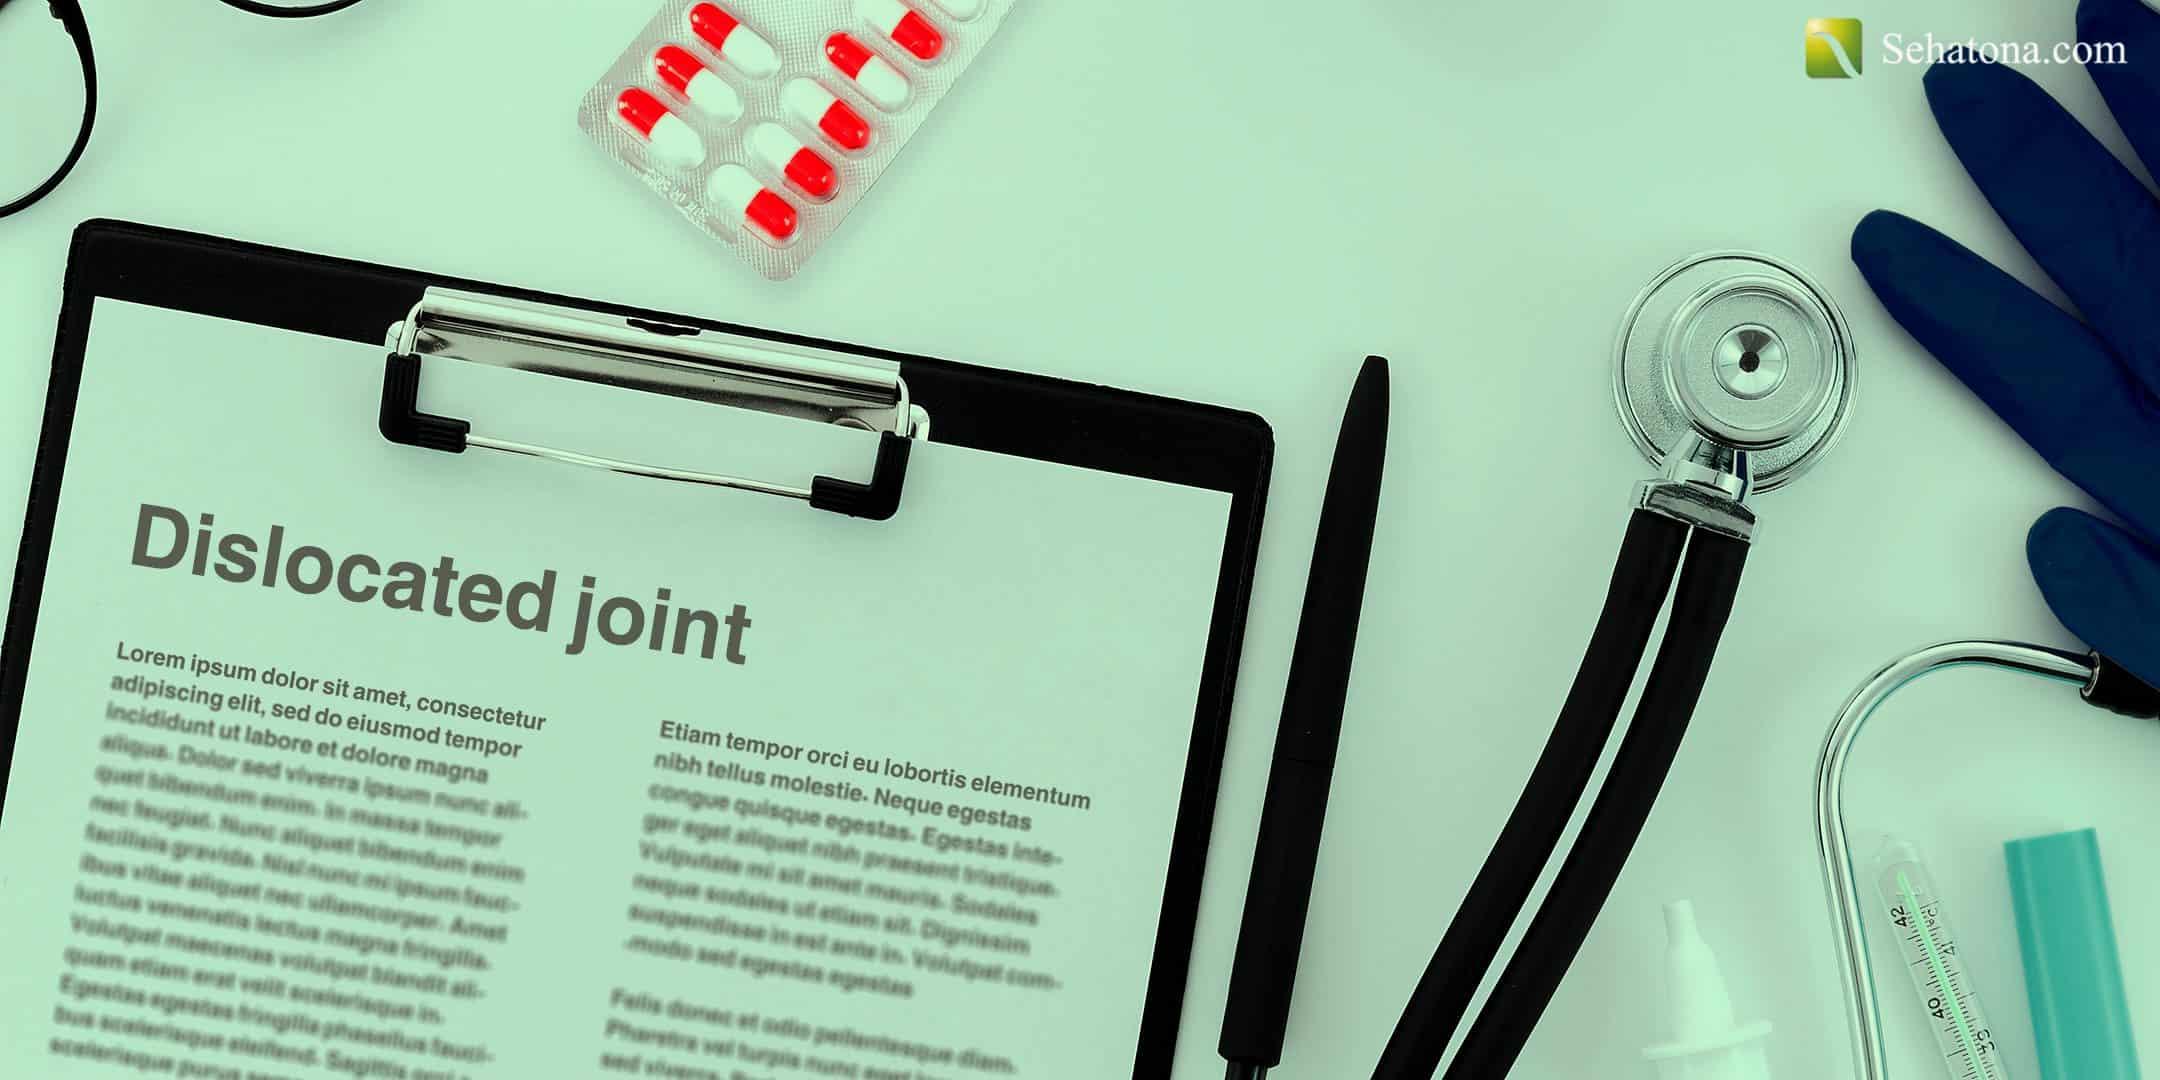 انخلاع المفصل Dislocated joint